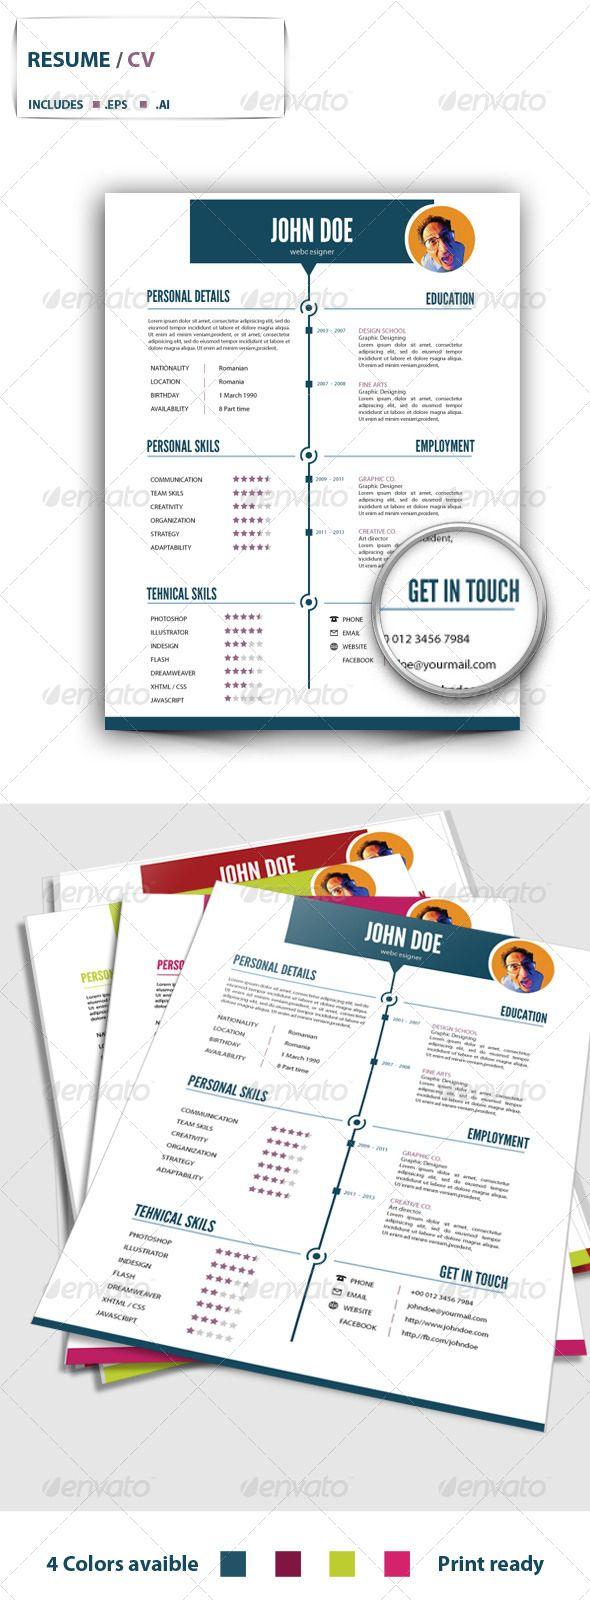 Resume v.1 | Resume cv, Fonts and Creative resume templates